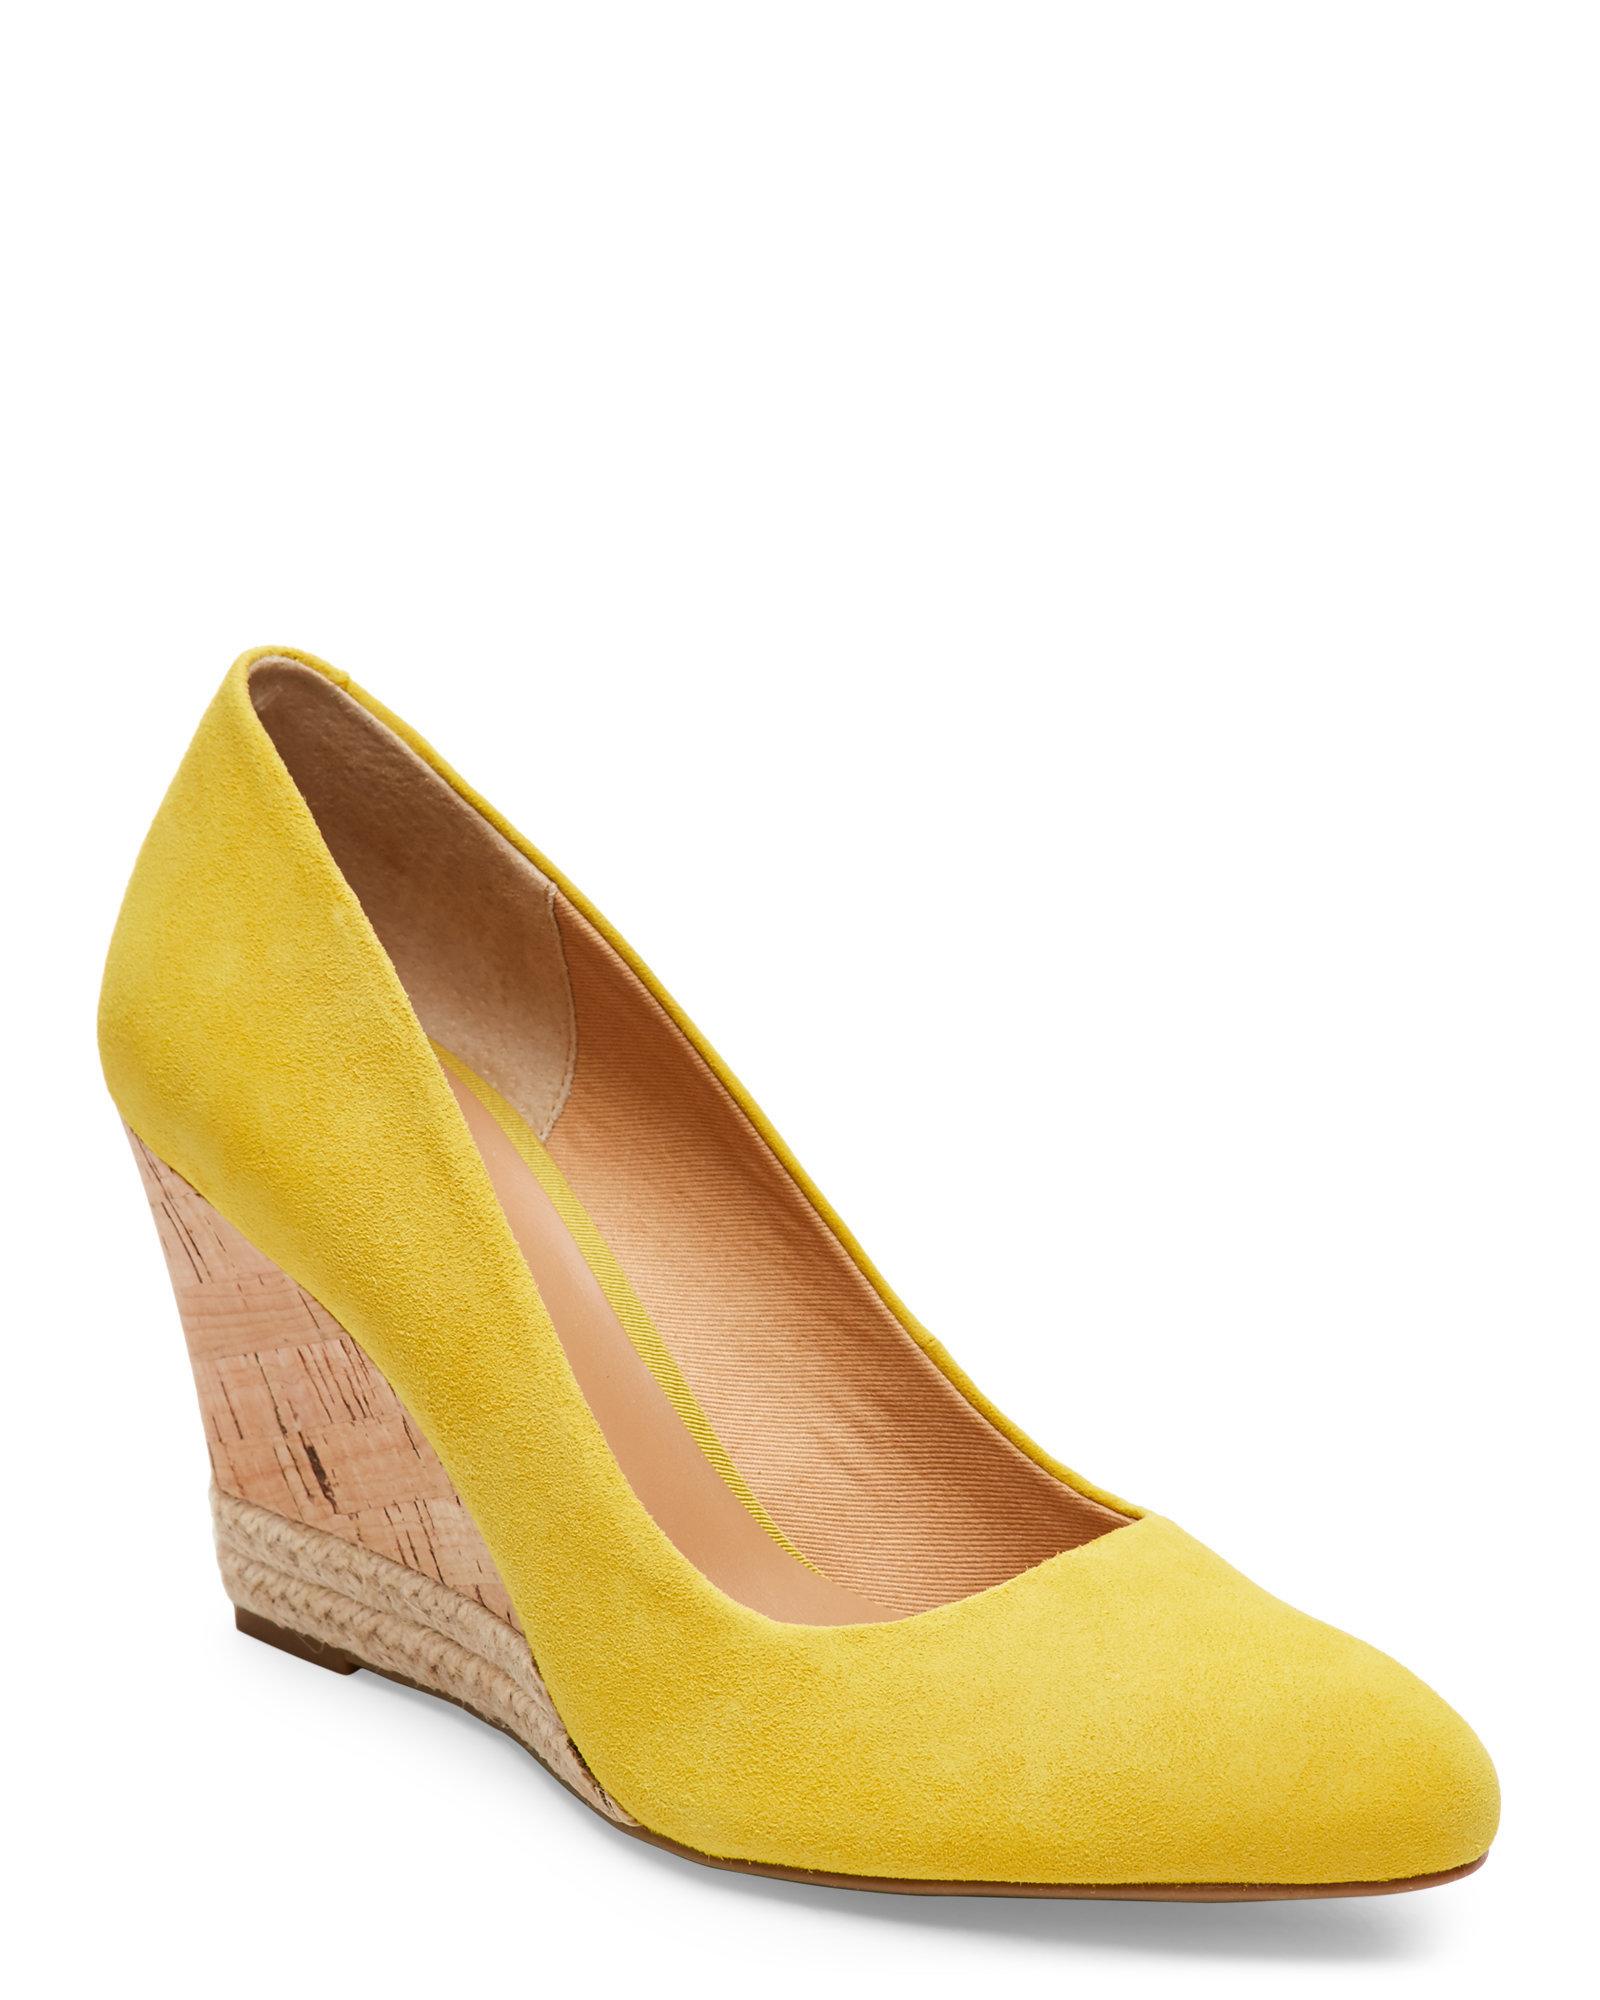 Lyst Franco Sarto Saffron Calix Cork Wedges In Yellow